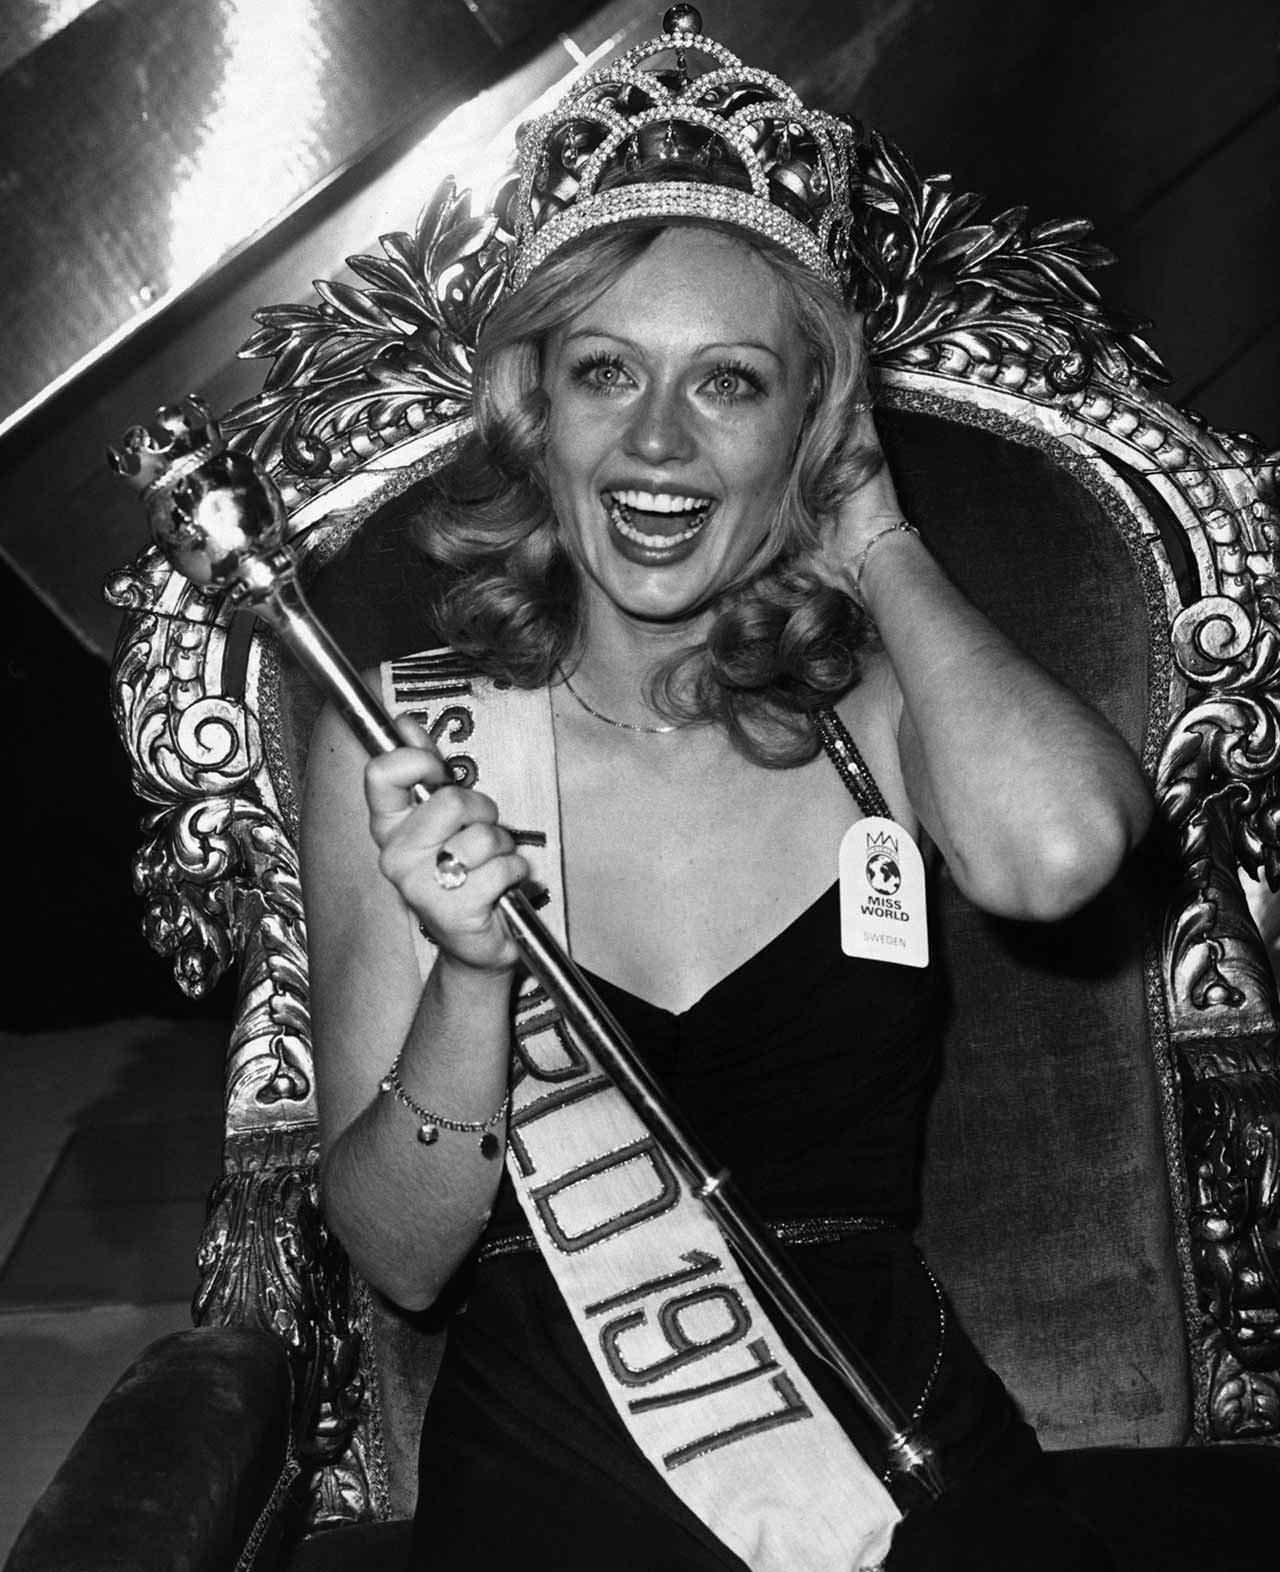 Фото | Мисс Мира 1977 года Мари Стэвин